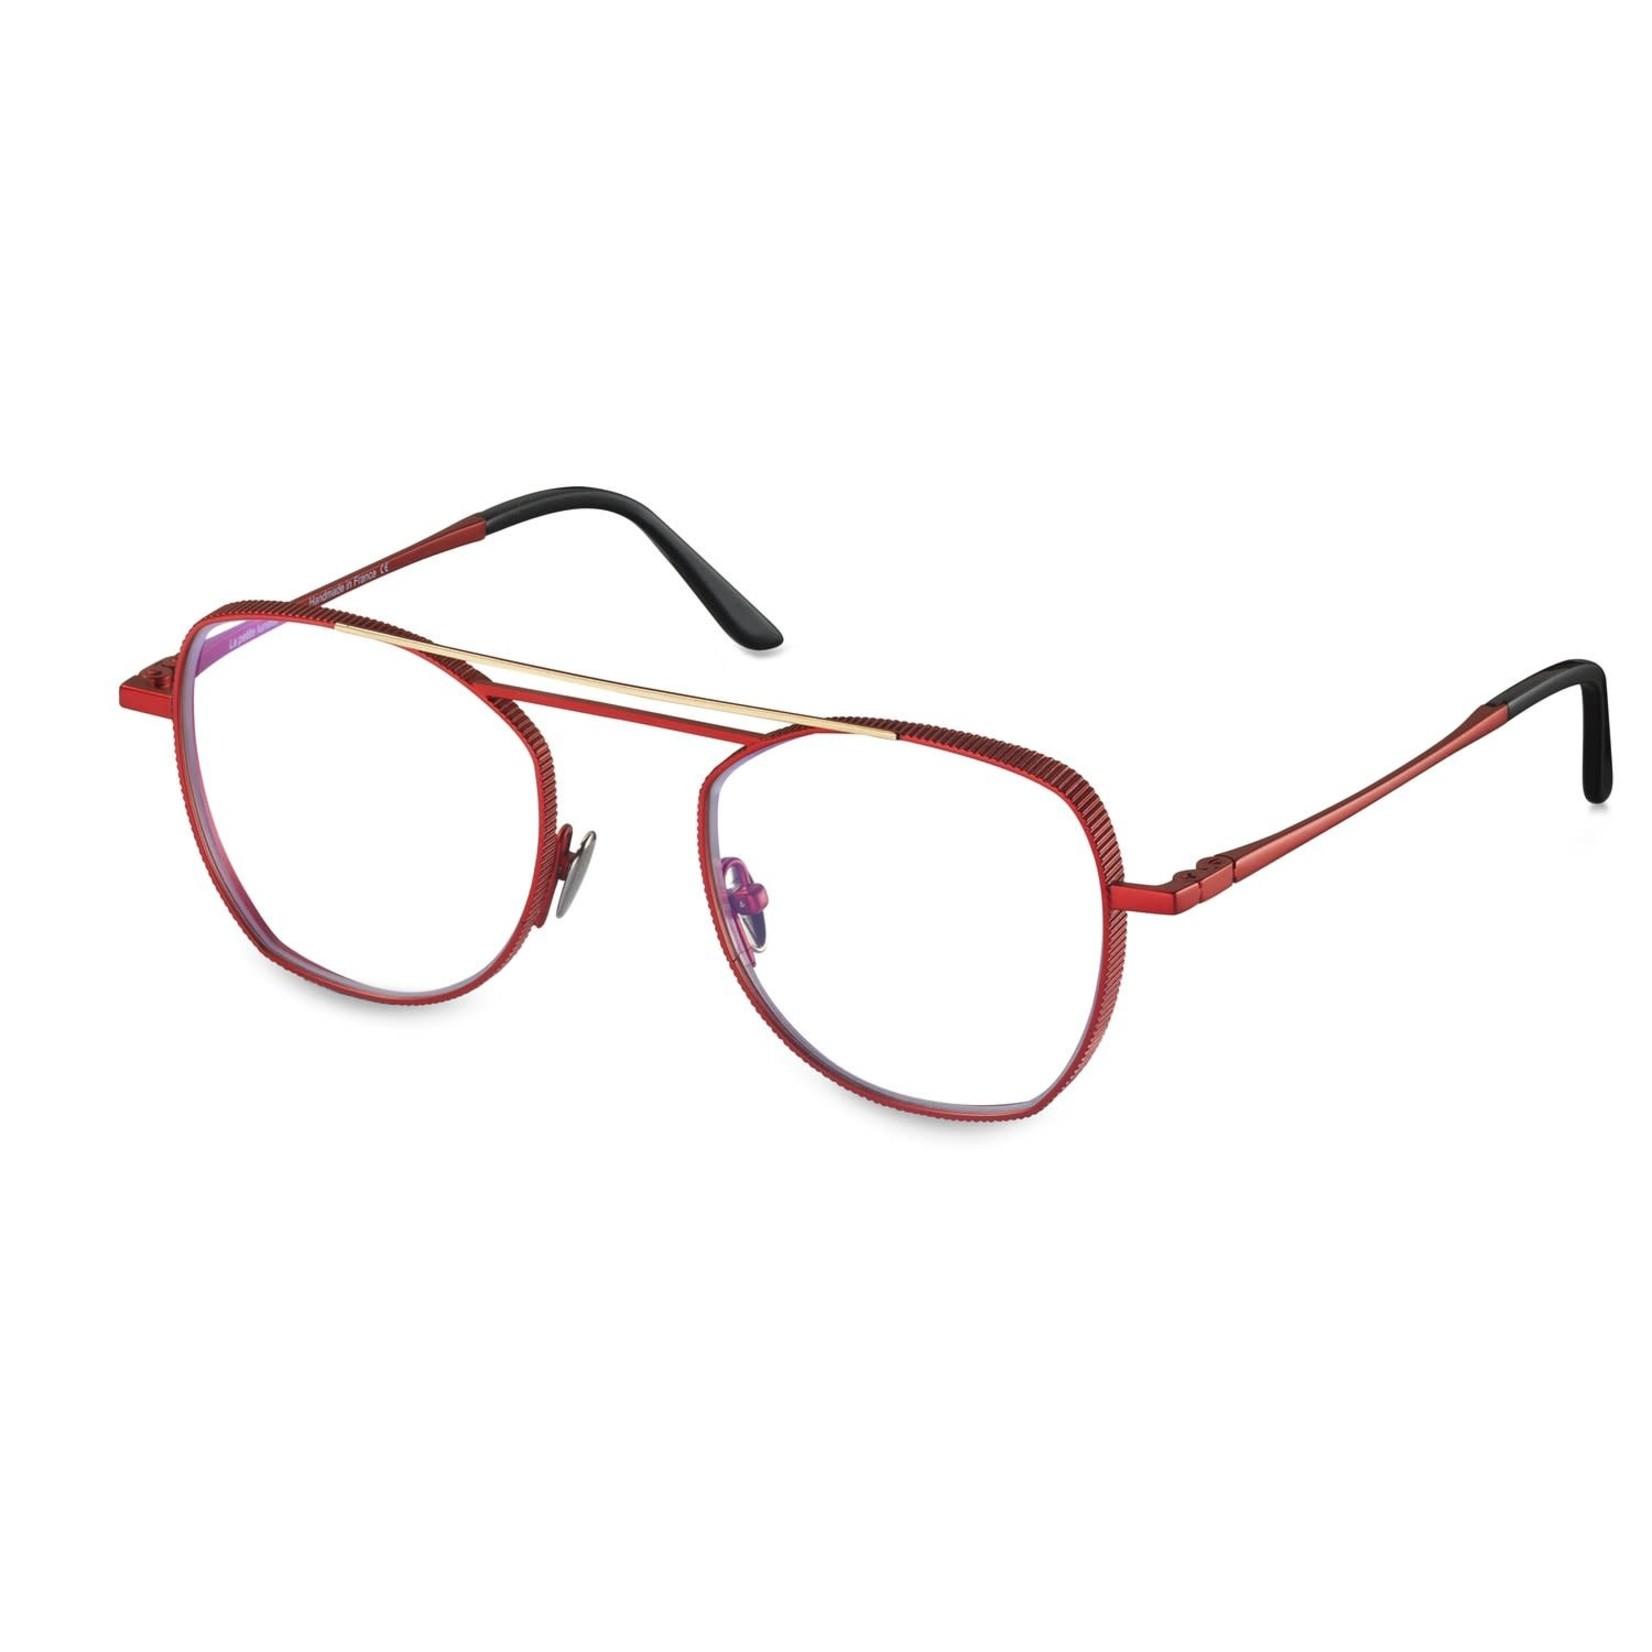 La Petite Lunette Eyewear LPLR Newhousie